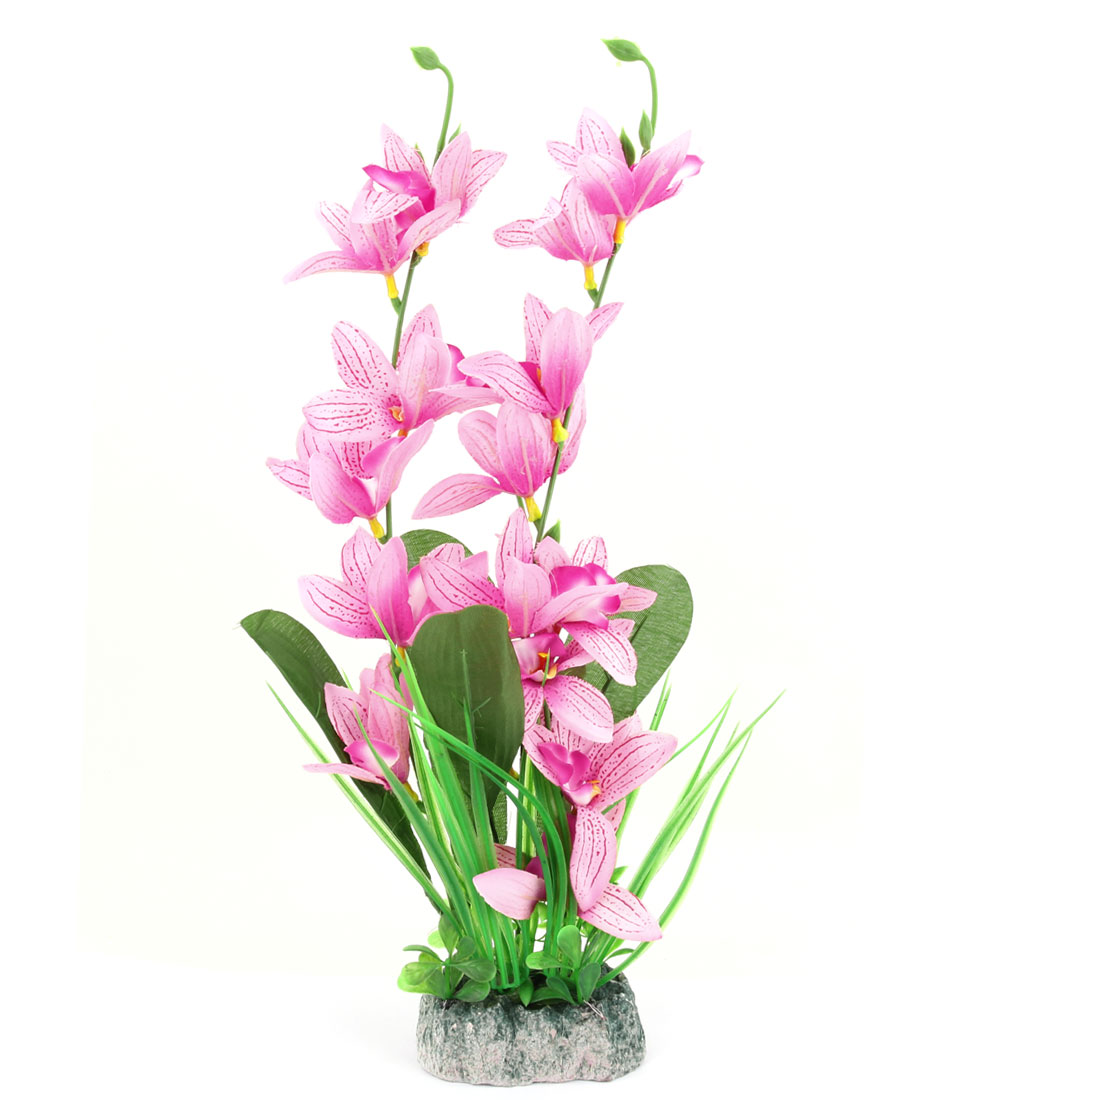 Fish Tank Plastic Fabric Artificial Lily Flower Aquarium Plant Ornament Pink Green